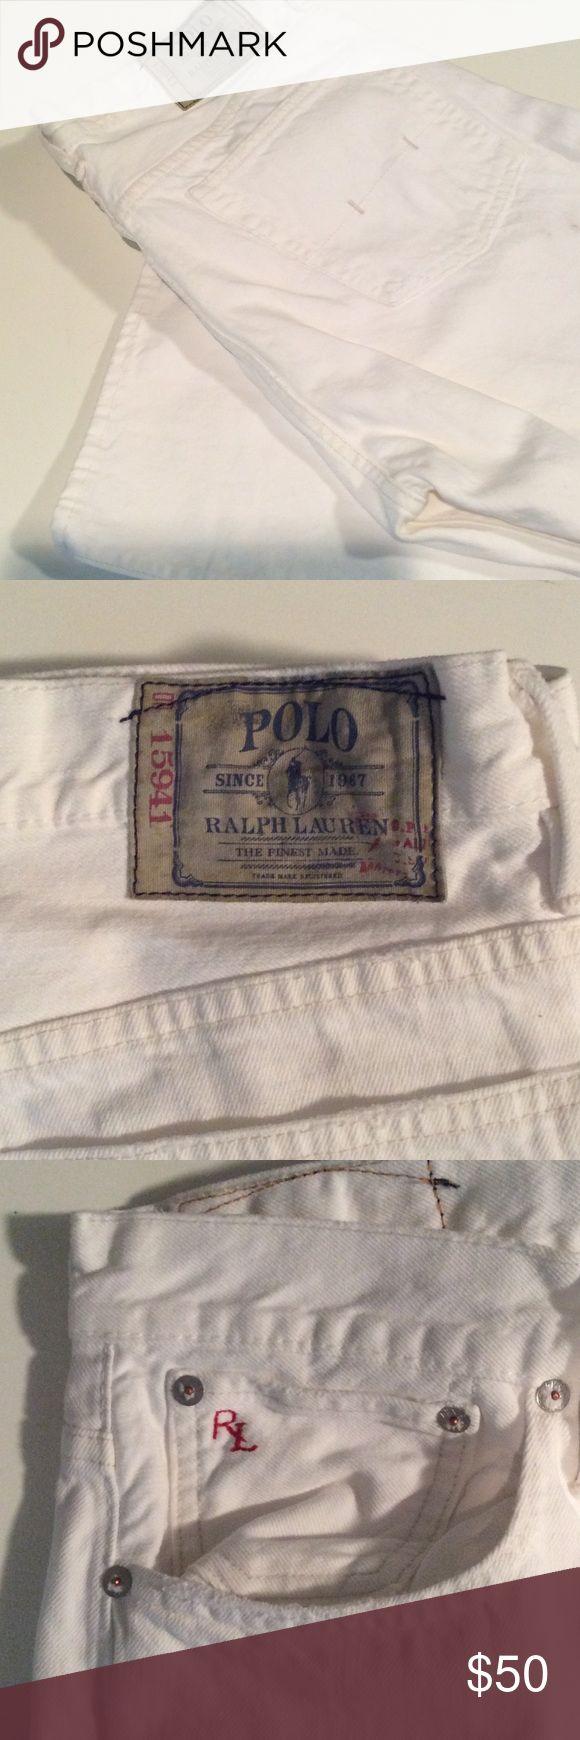 Men's White Ralph Lauren Jeans 🆕 Never worn white Ralph Lauren Jeans. In great shape. Great for summer. Lauren Ralph Lauren Jeans Bootcut